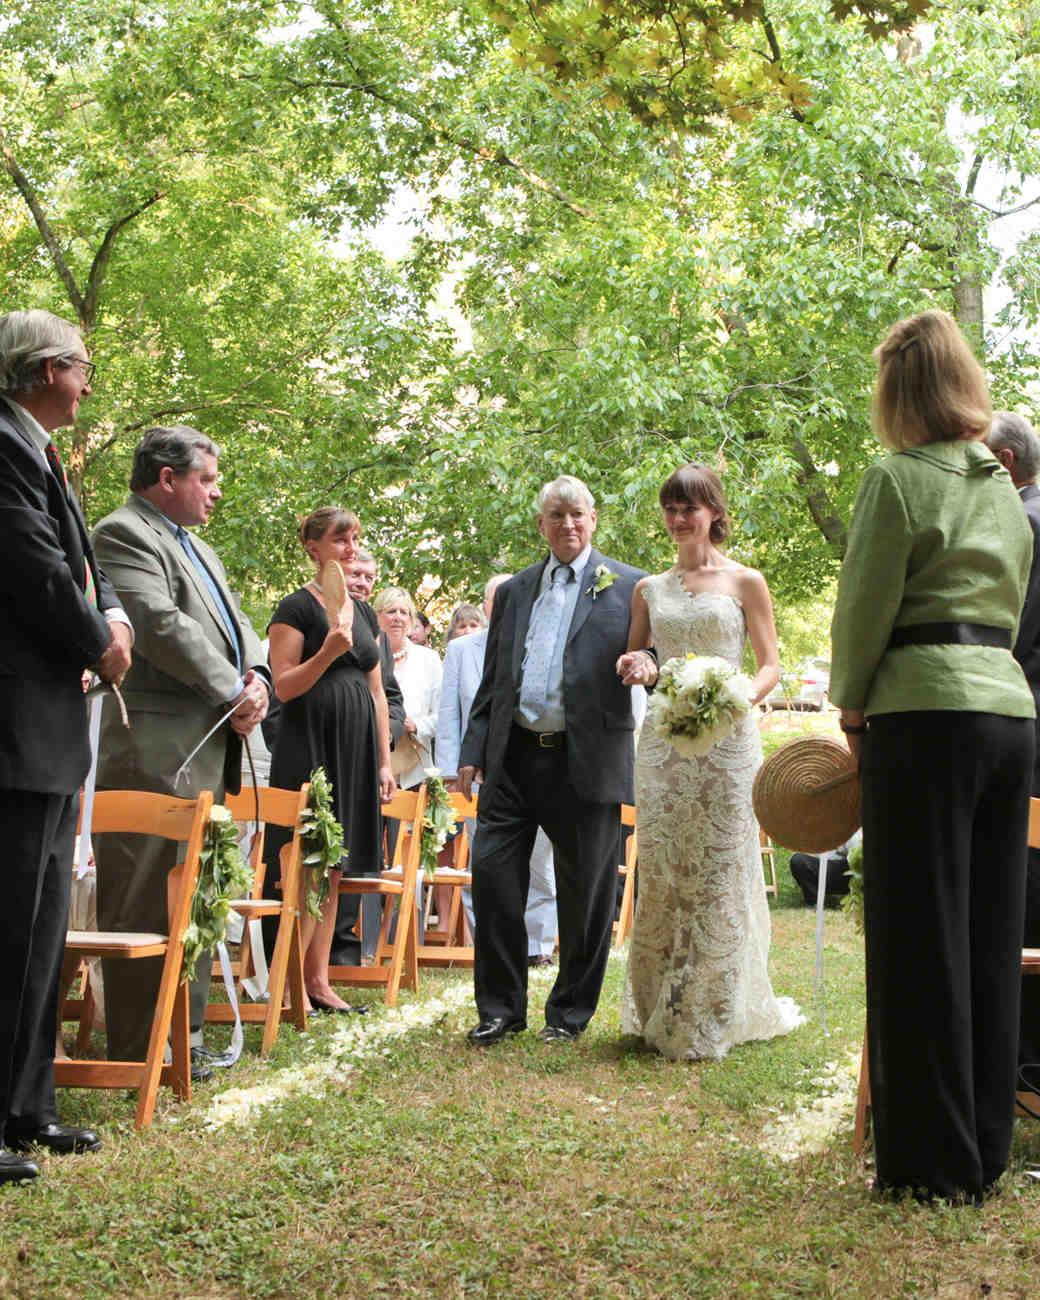 Ribboned Wedding Invitations 018 - Ribboned Wedding Invitations